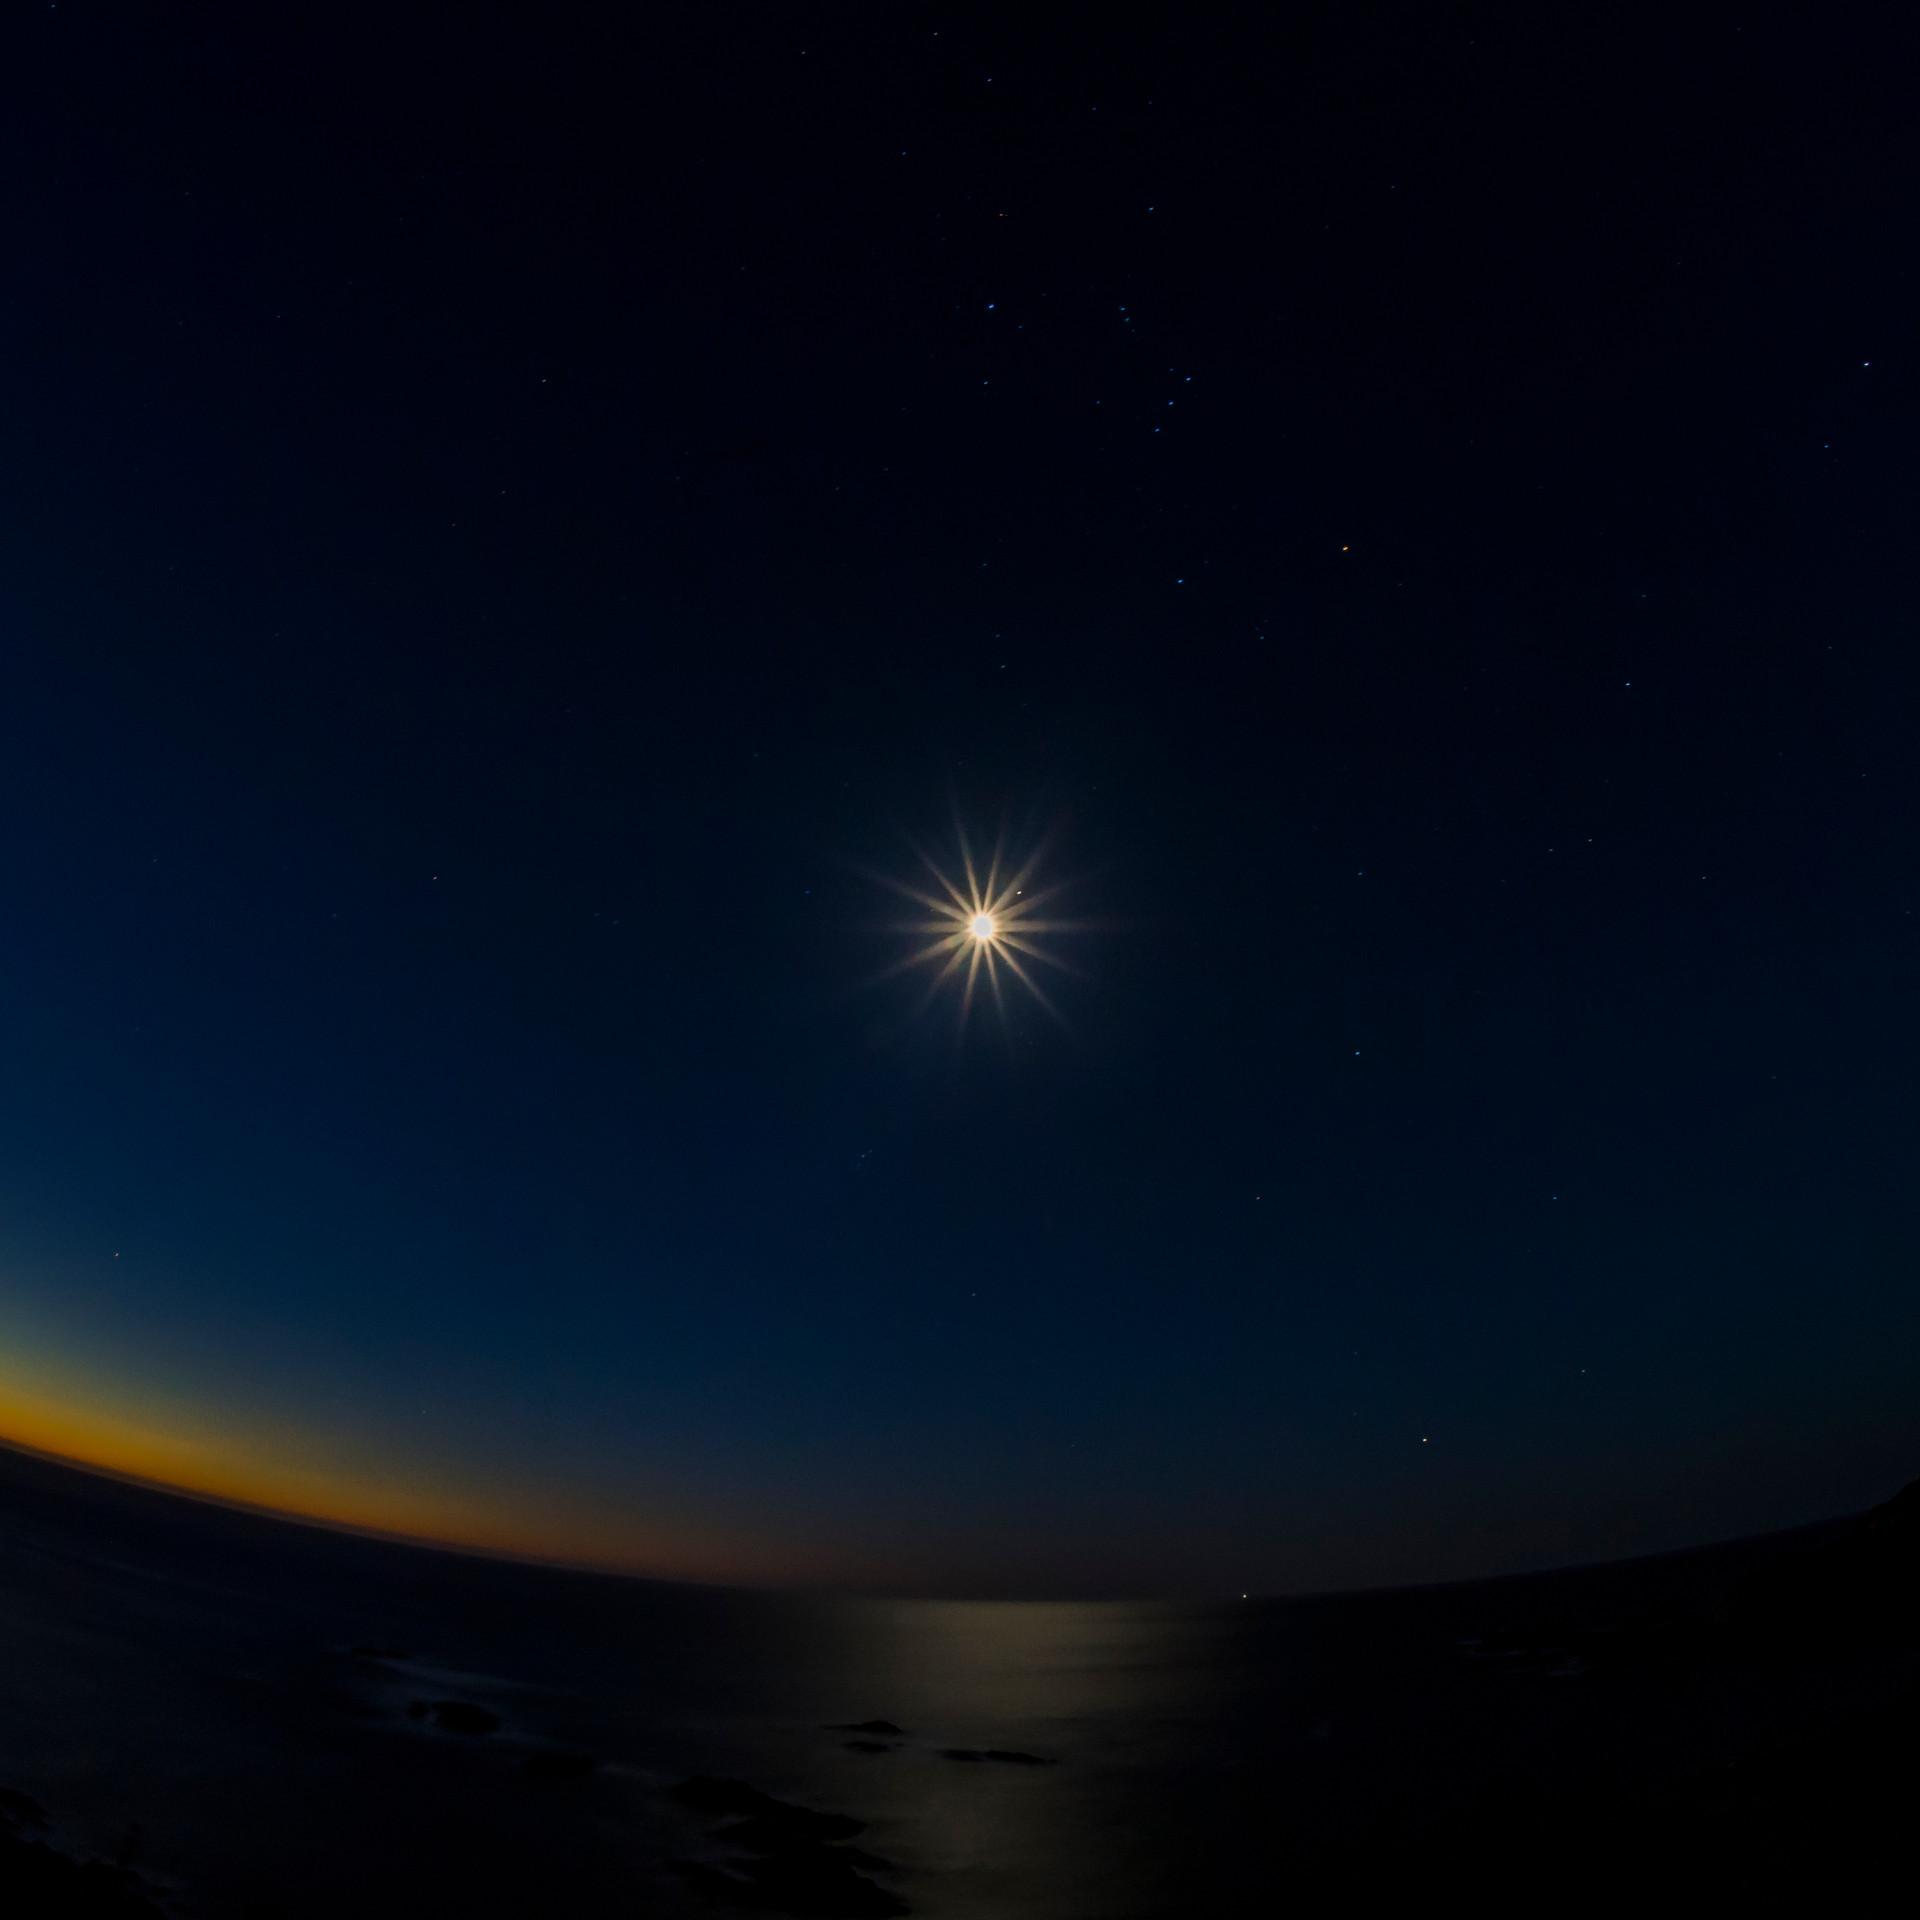 Caleta Perone luna jorge burdiles41092.j